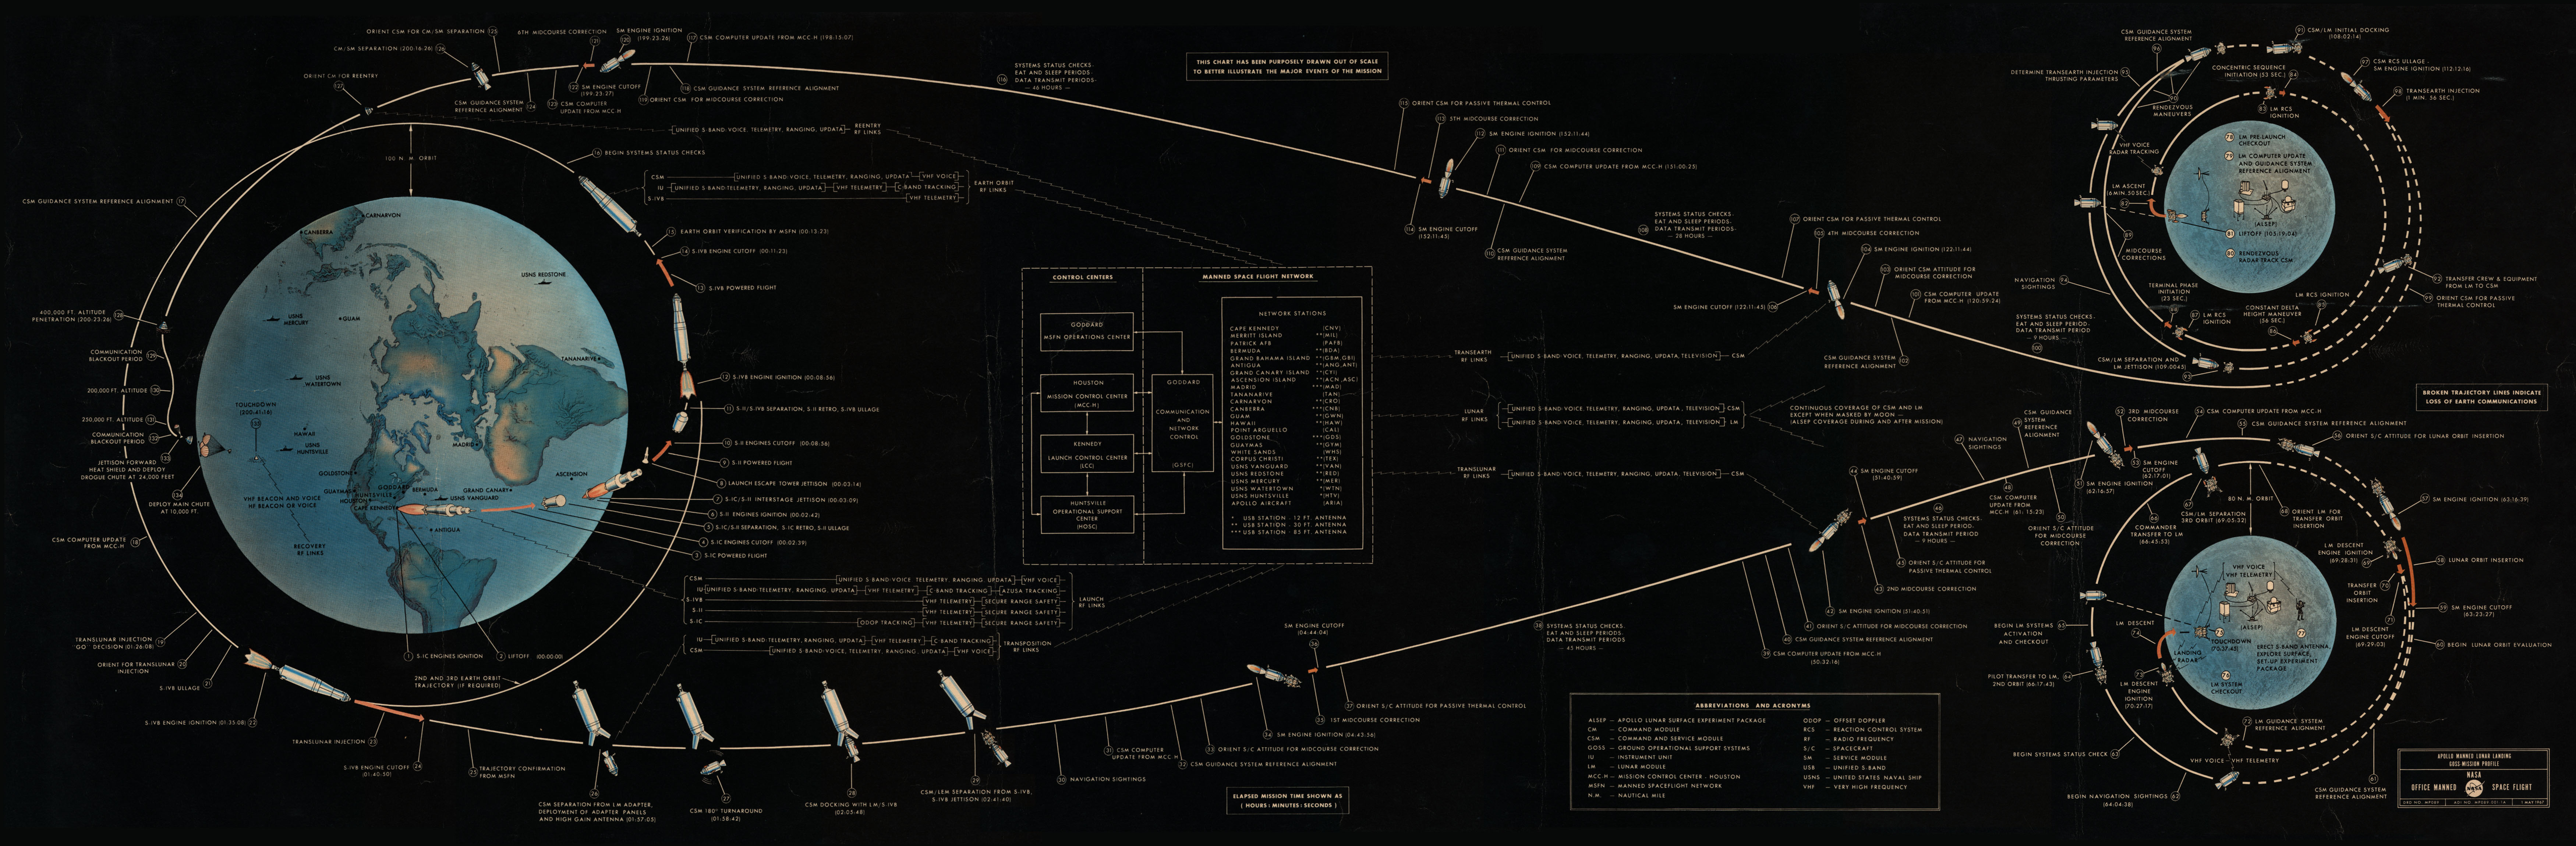 Nasa Apollo 11 Flight Plan